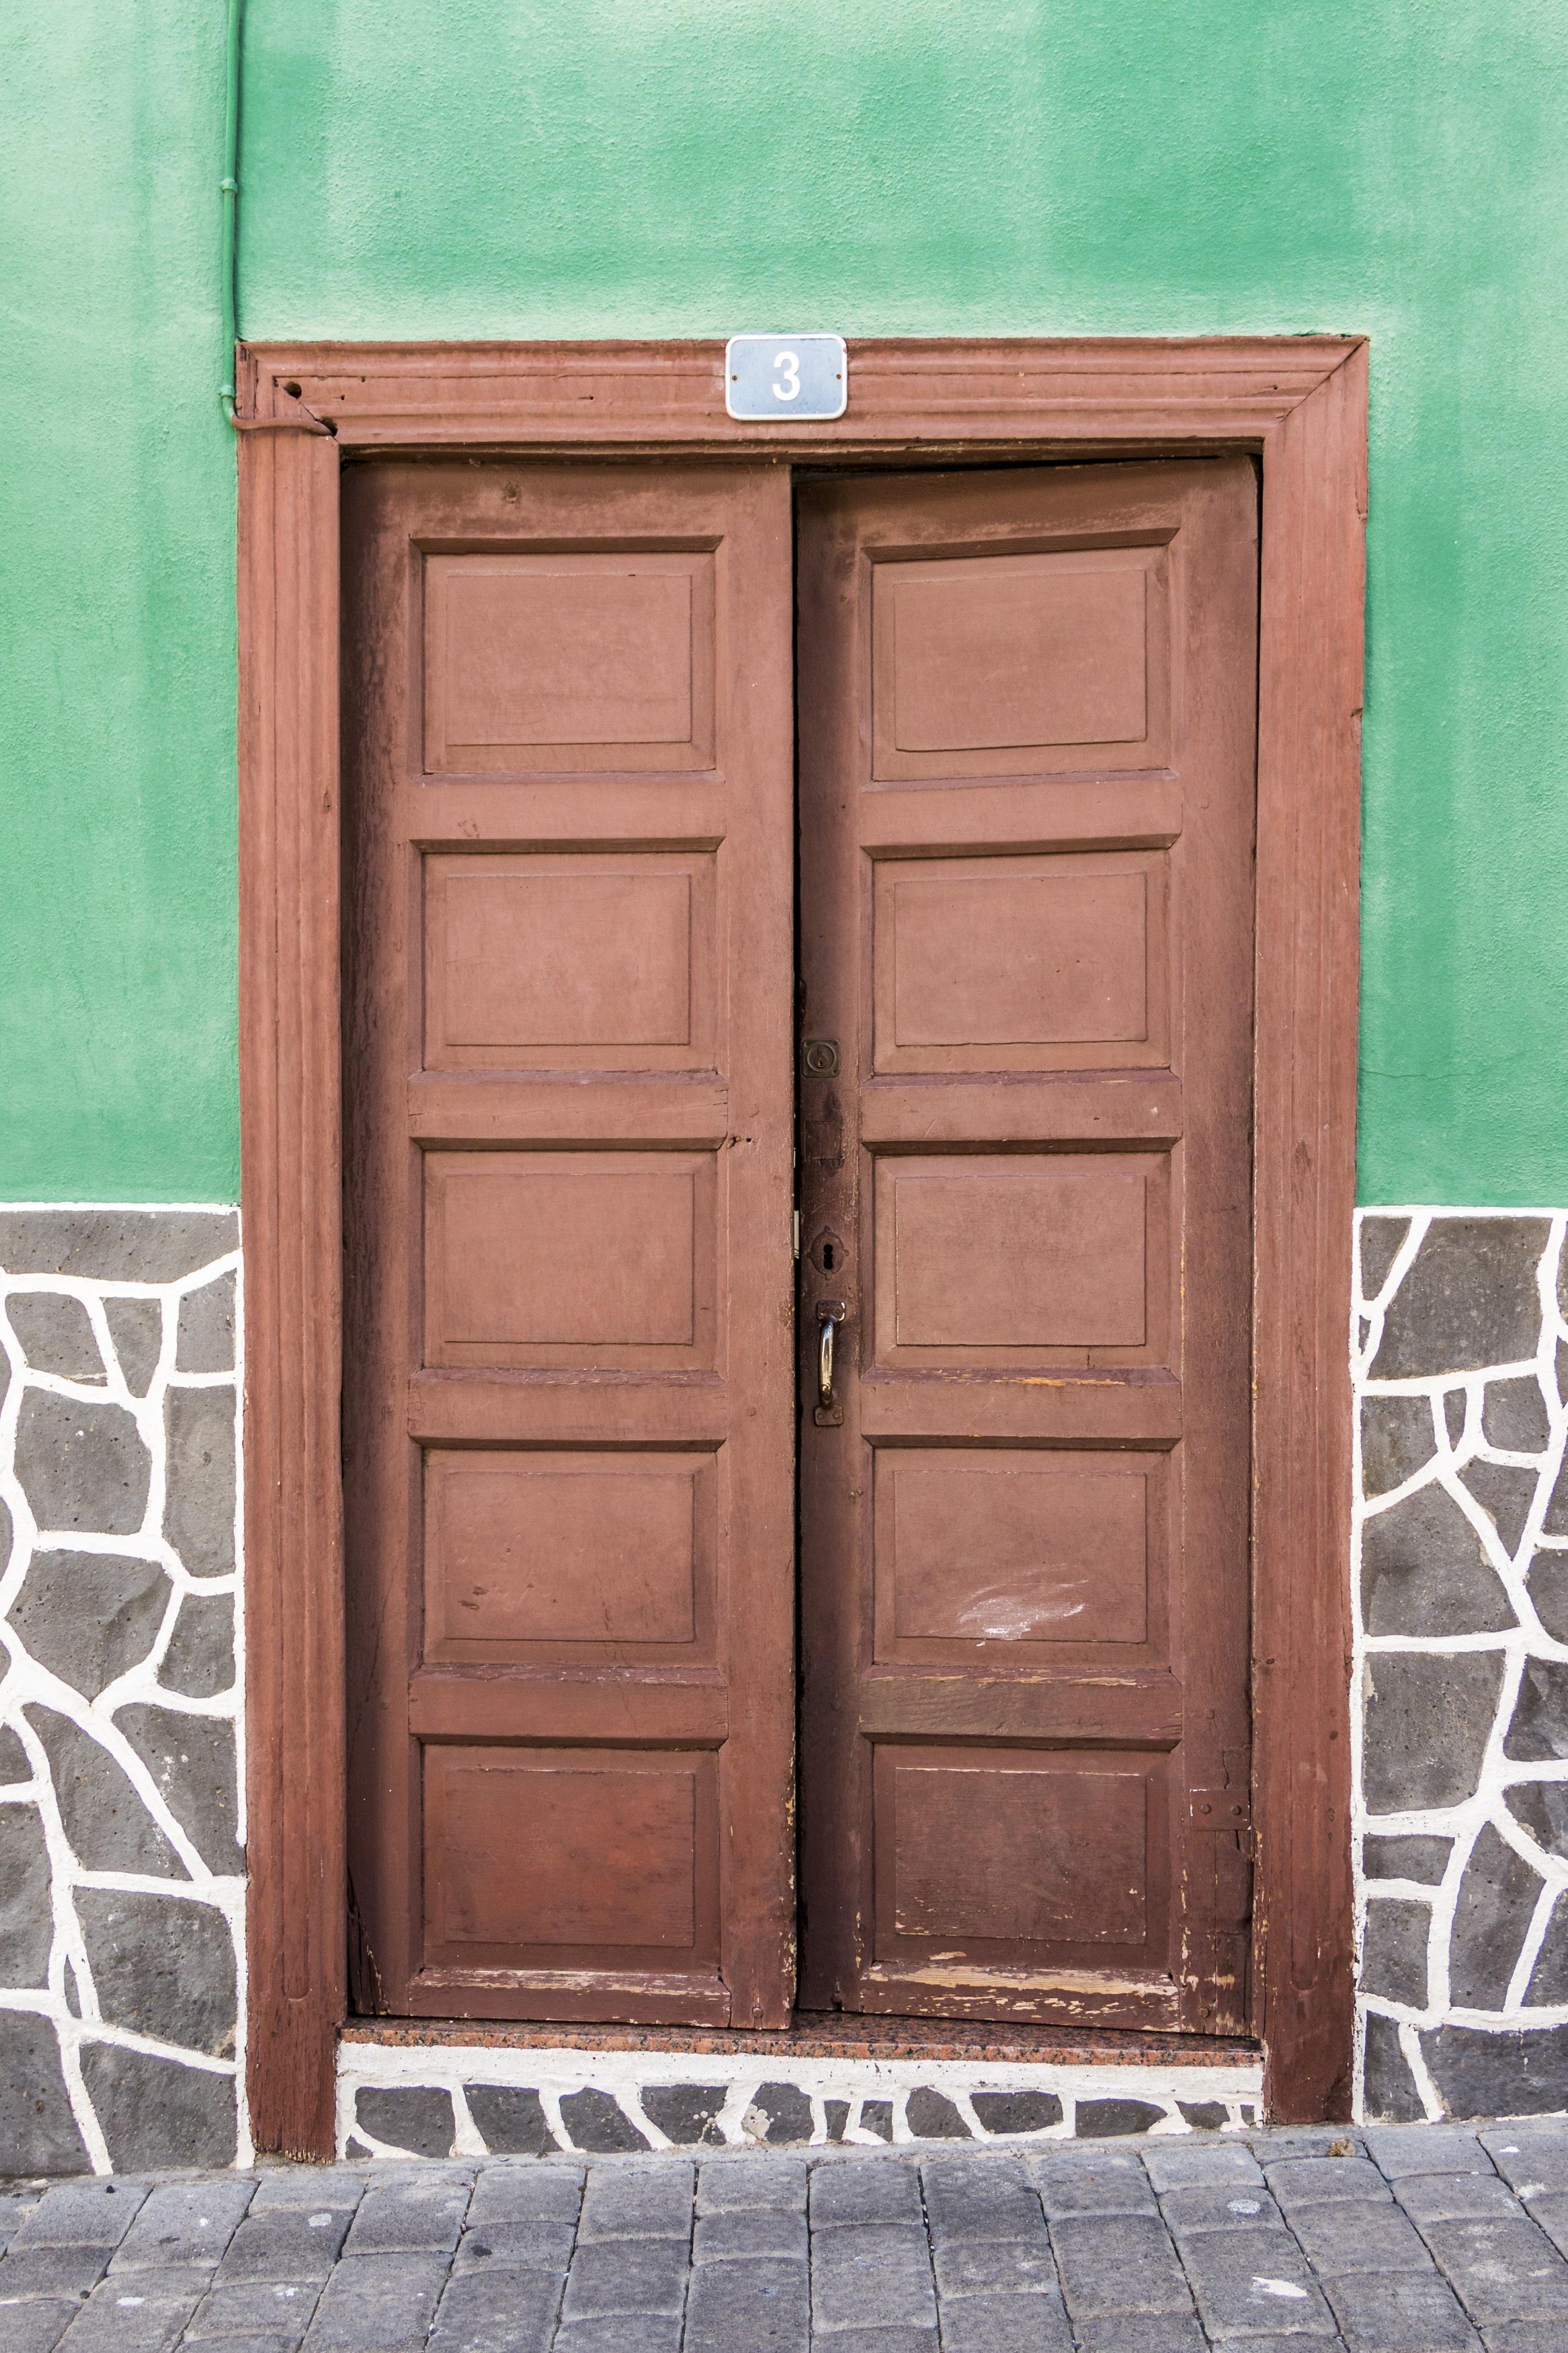 Fotos gratis : ventana, antiguo, portón, Gol, puerta principal ...